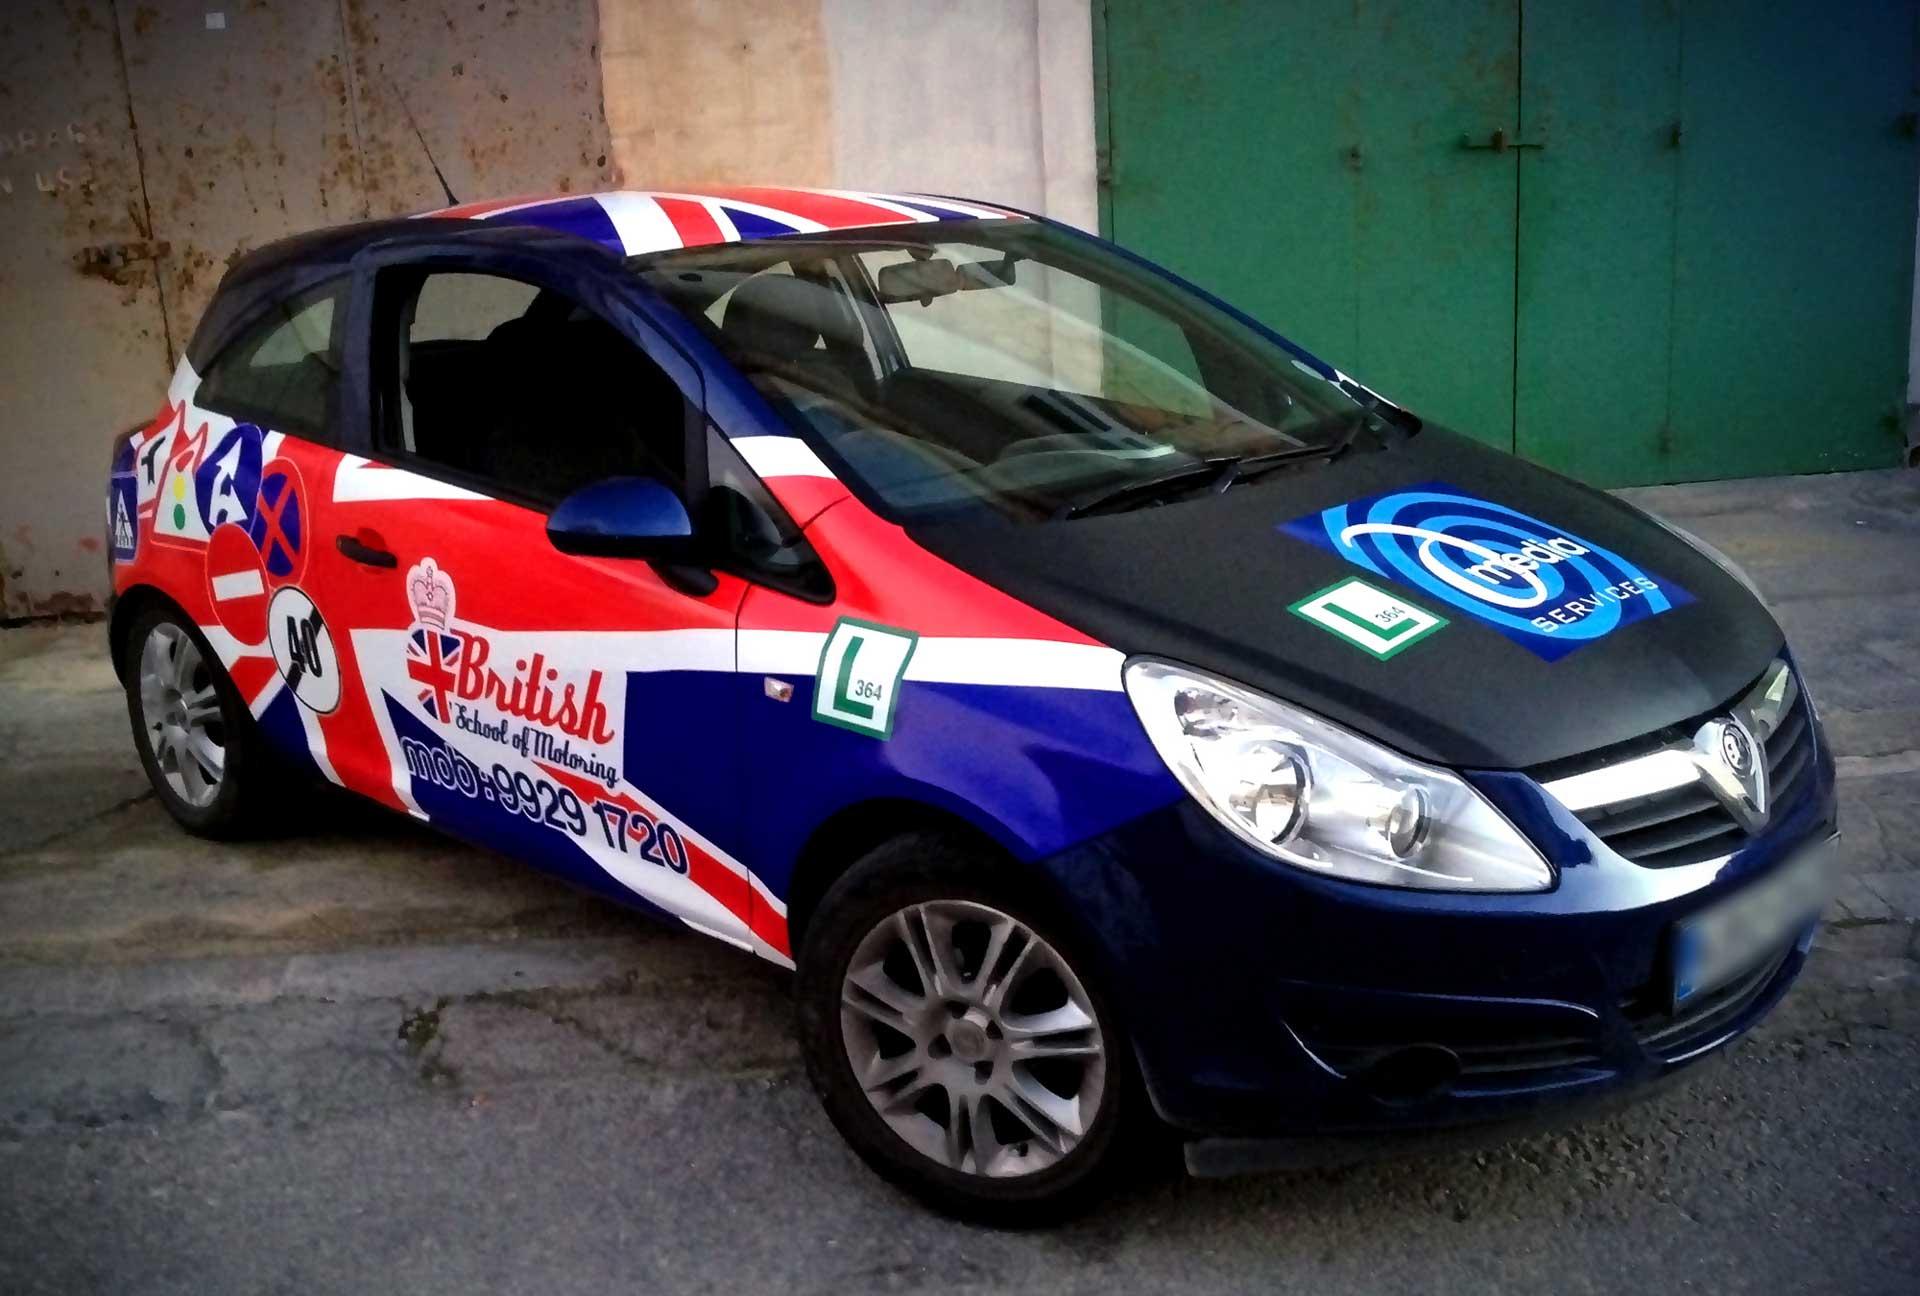 Vehicle Wrapping - British School of Motoring Car